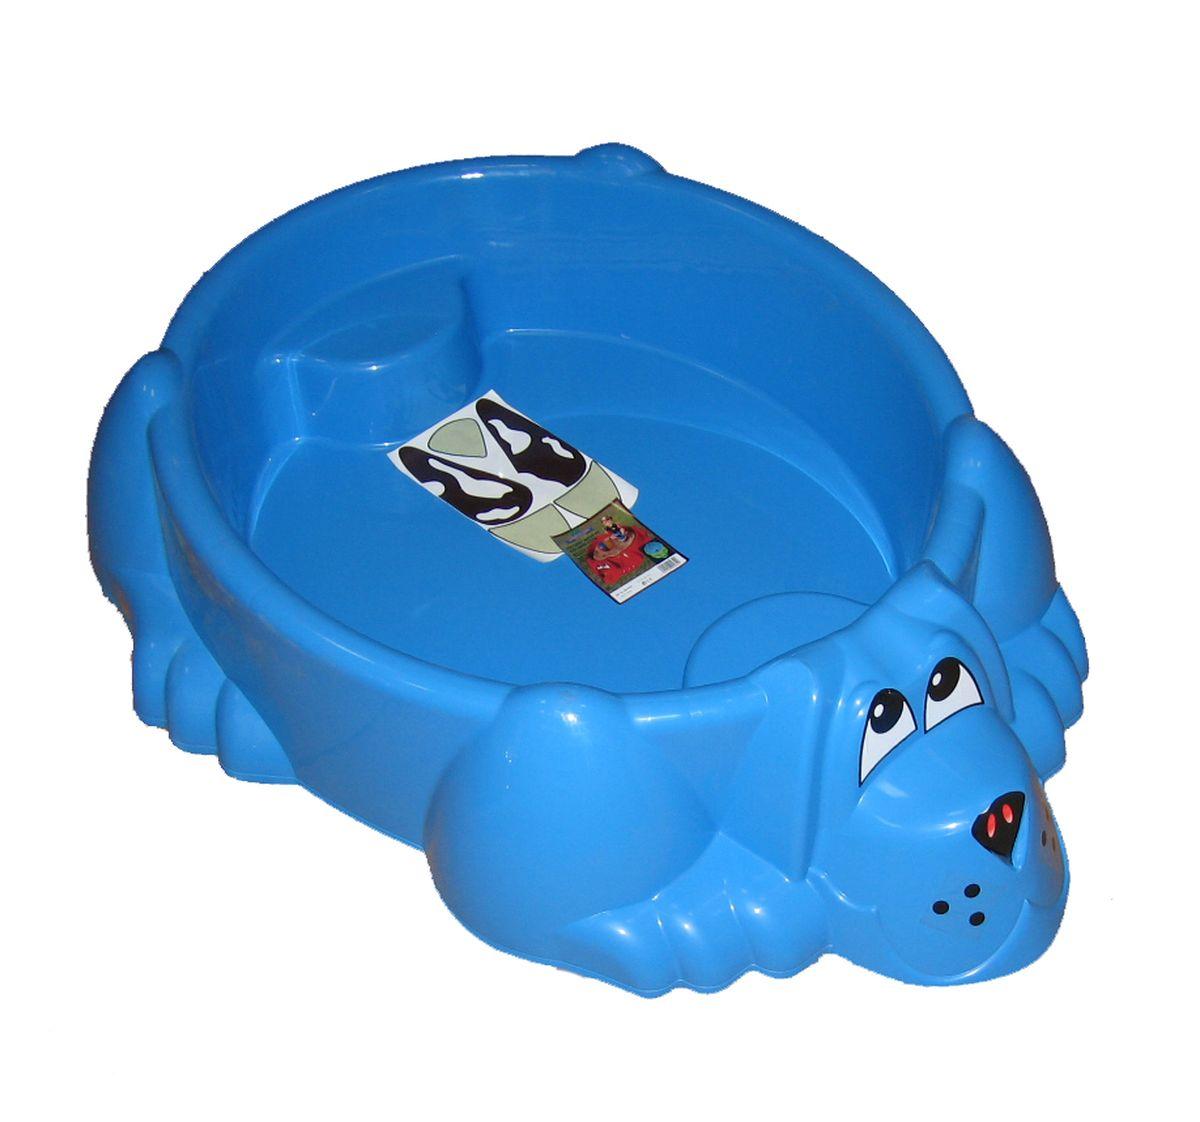 Marian Plast Бассейн Собачка цвет синий palplay marian plast песочница бассейн собачка тент